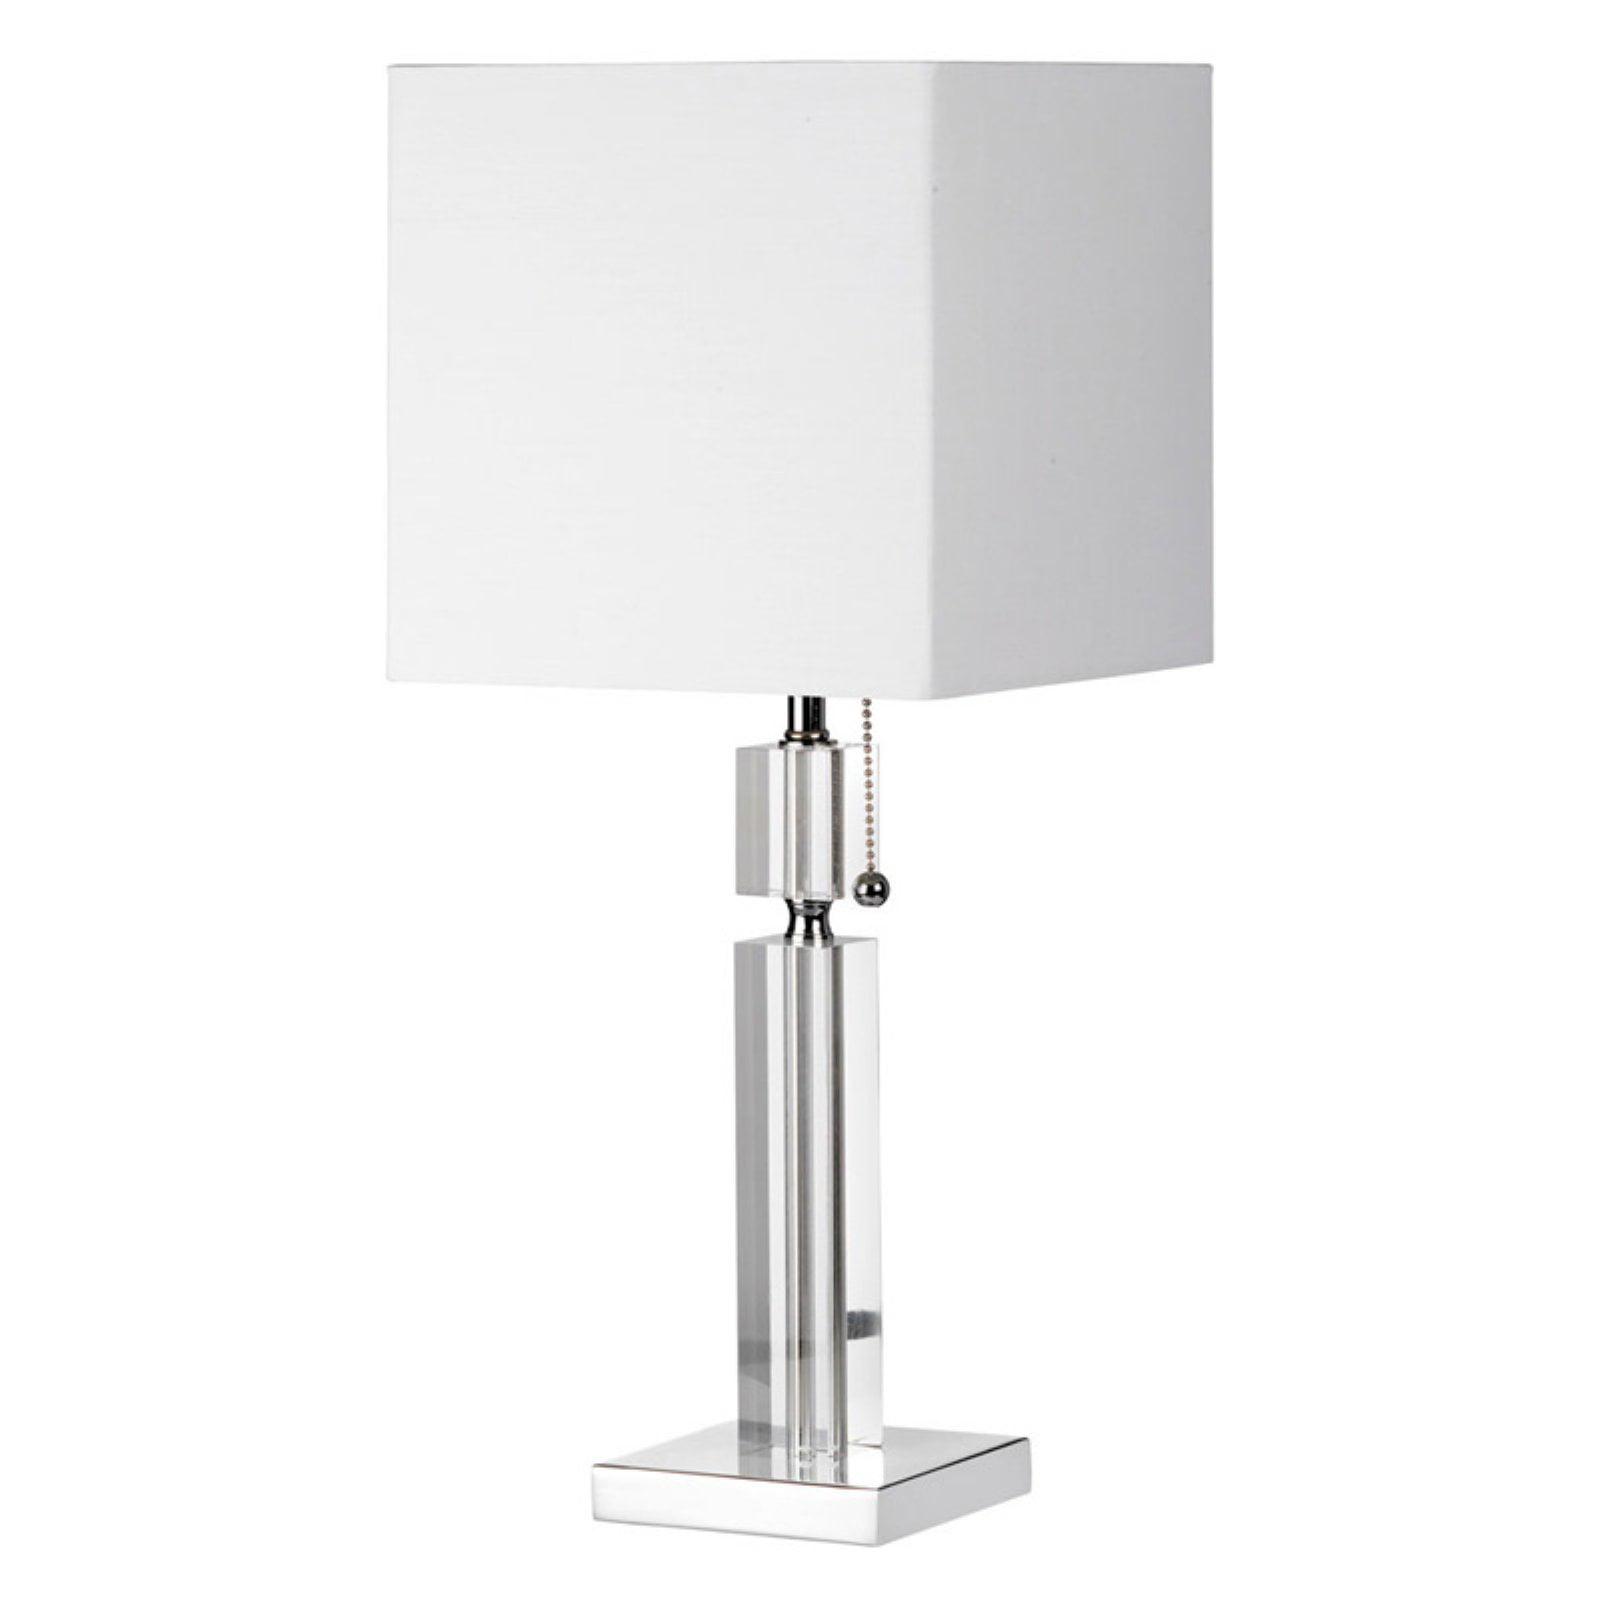 Dainolite DM231-PC Table Lamp by Dainolite Ltd